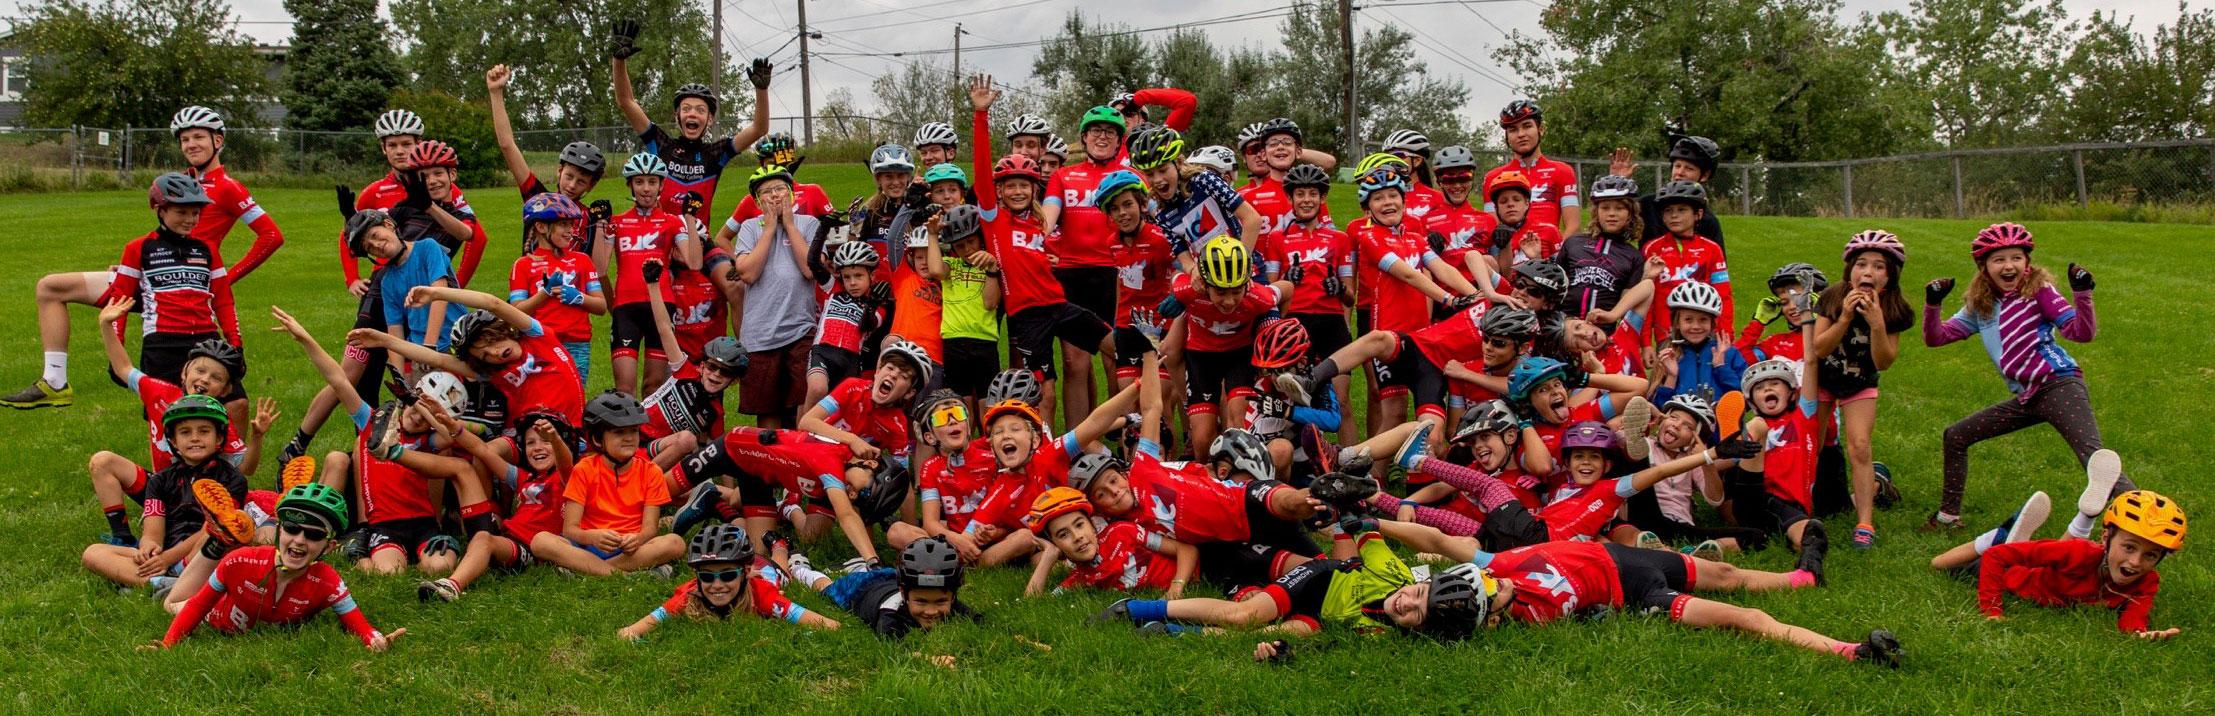 Boulder Junior Cycling